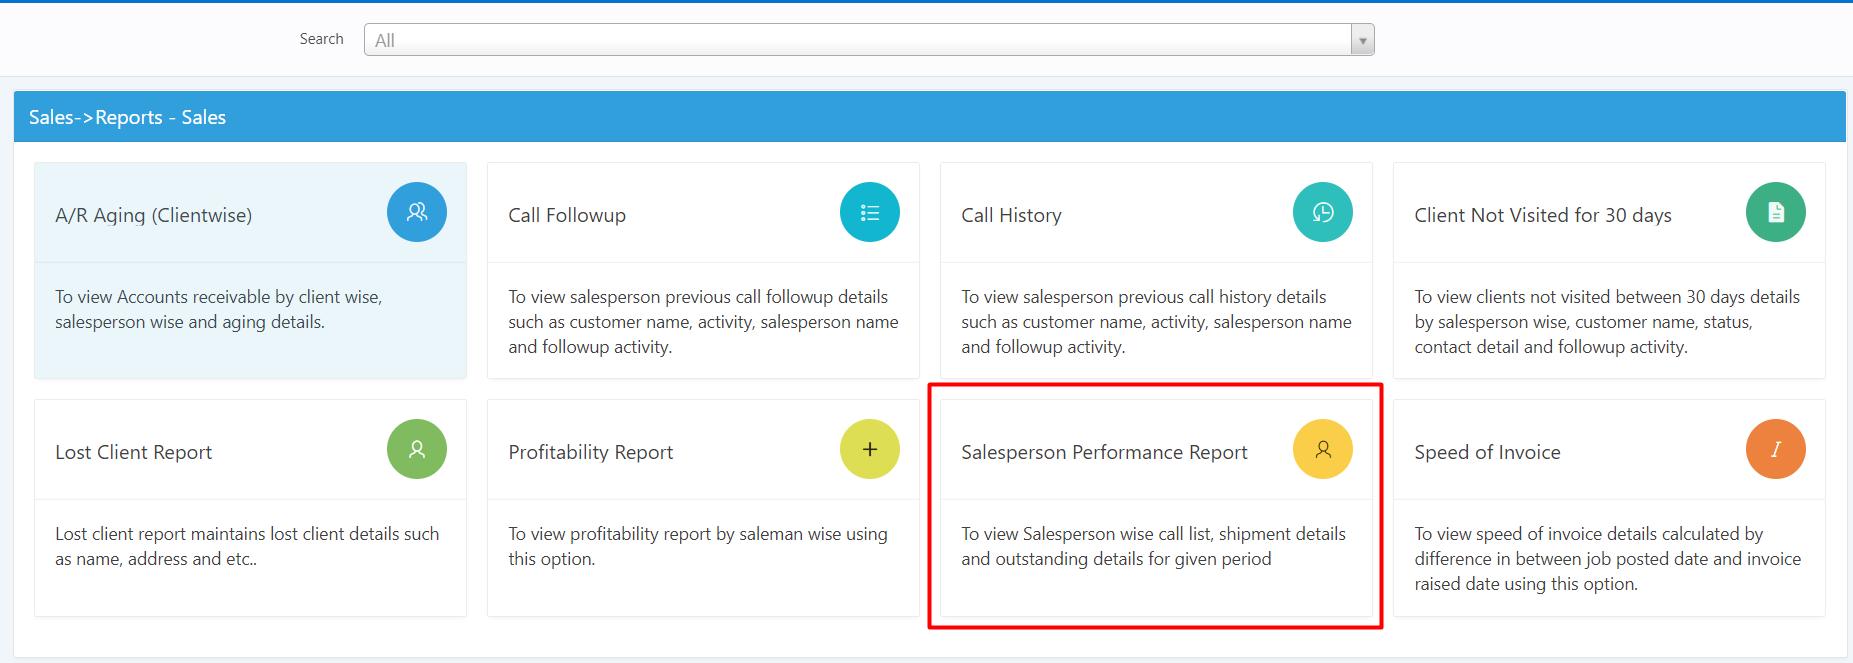 SALESMAN PERFORMANCE REPORT